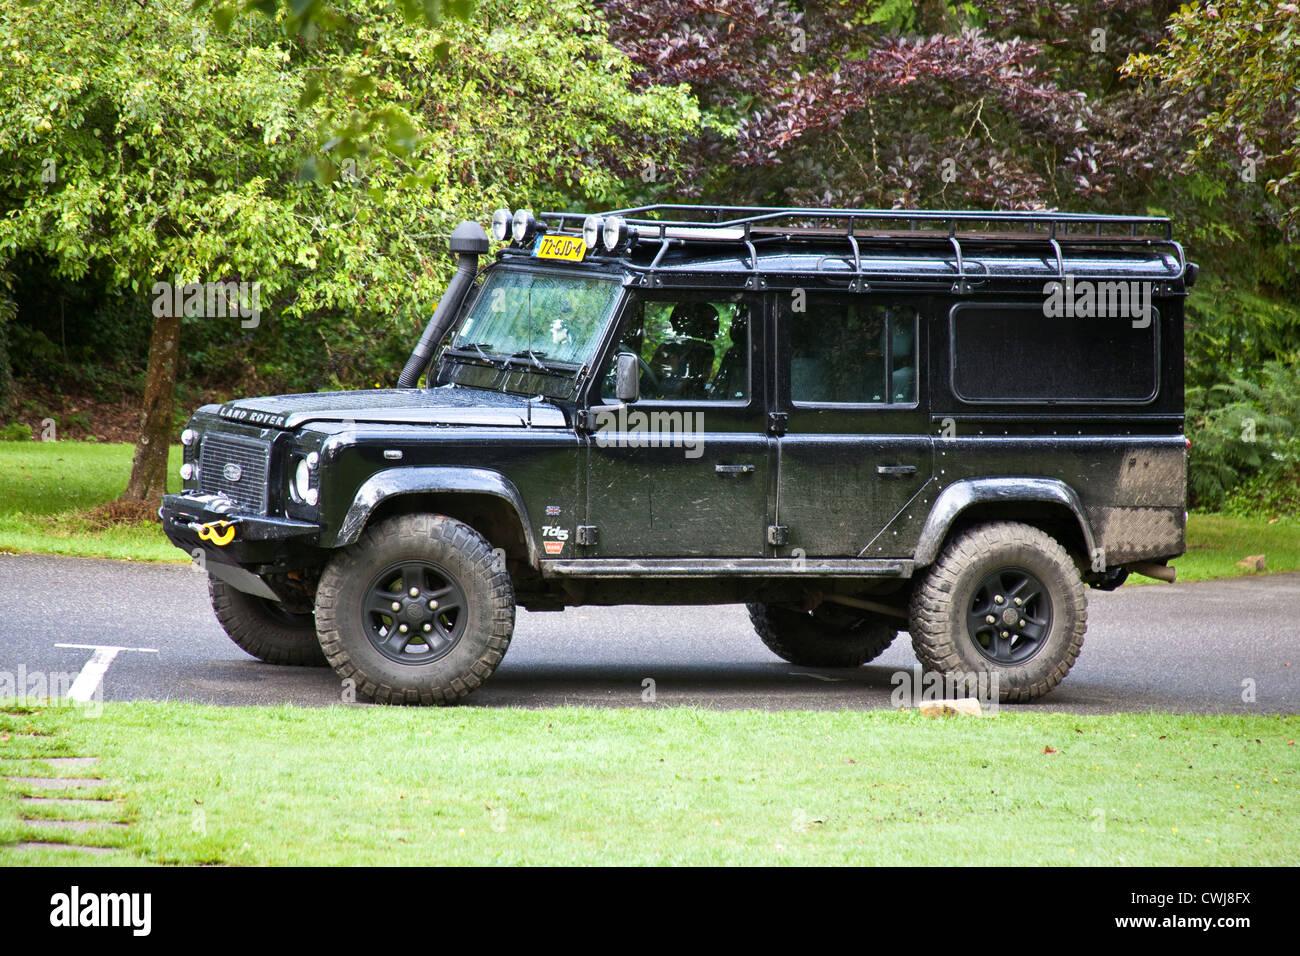 Range Rover Black >> Land Rover Defender 110 Stock Photos & Land Rover Defender 110 Stock Images - Alamy